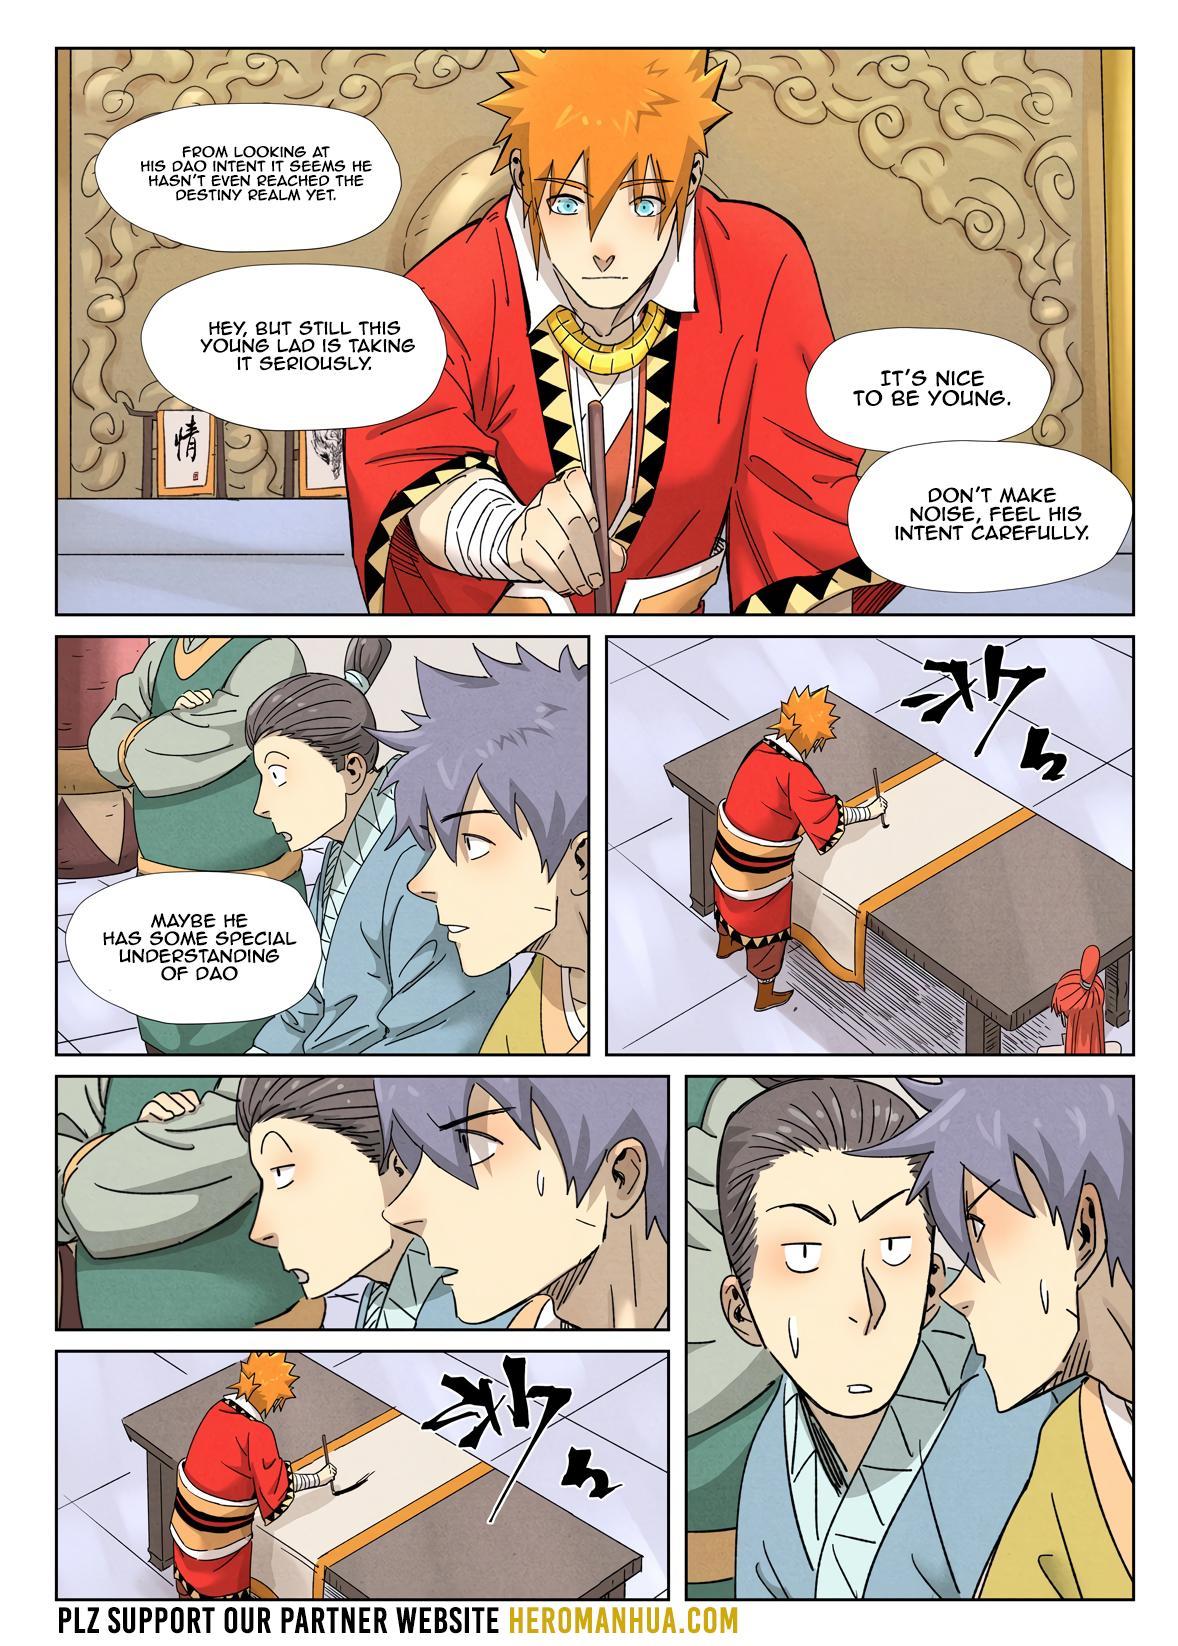 Tales Of Demons And Gods Chapter 341.1 page 7 - Mangakakalot